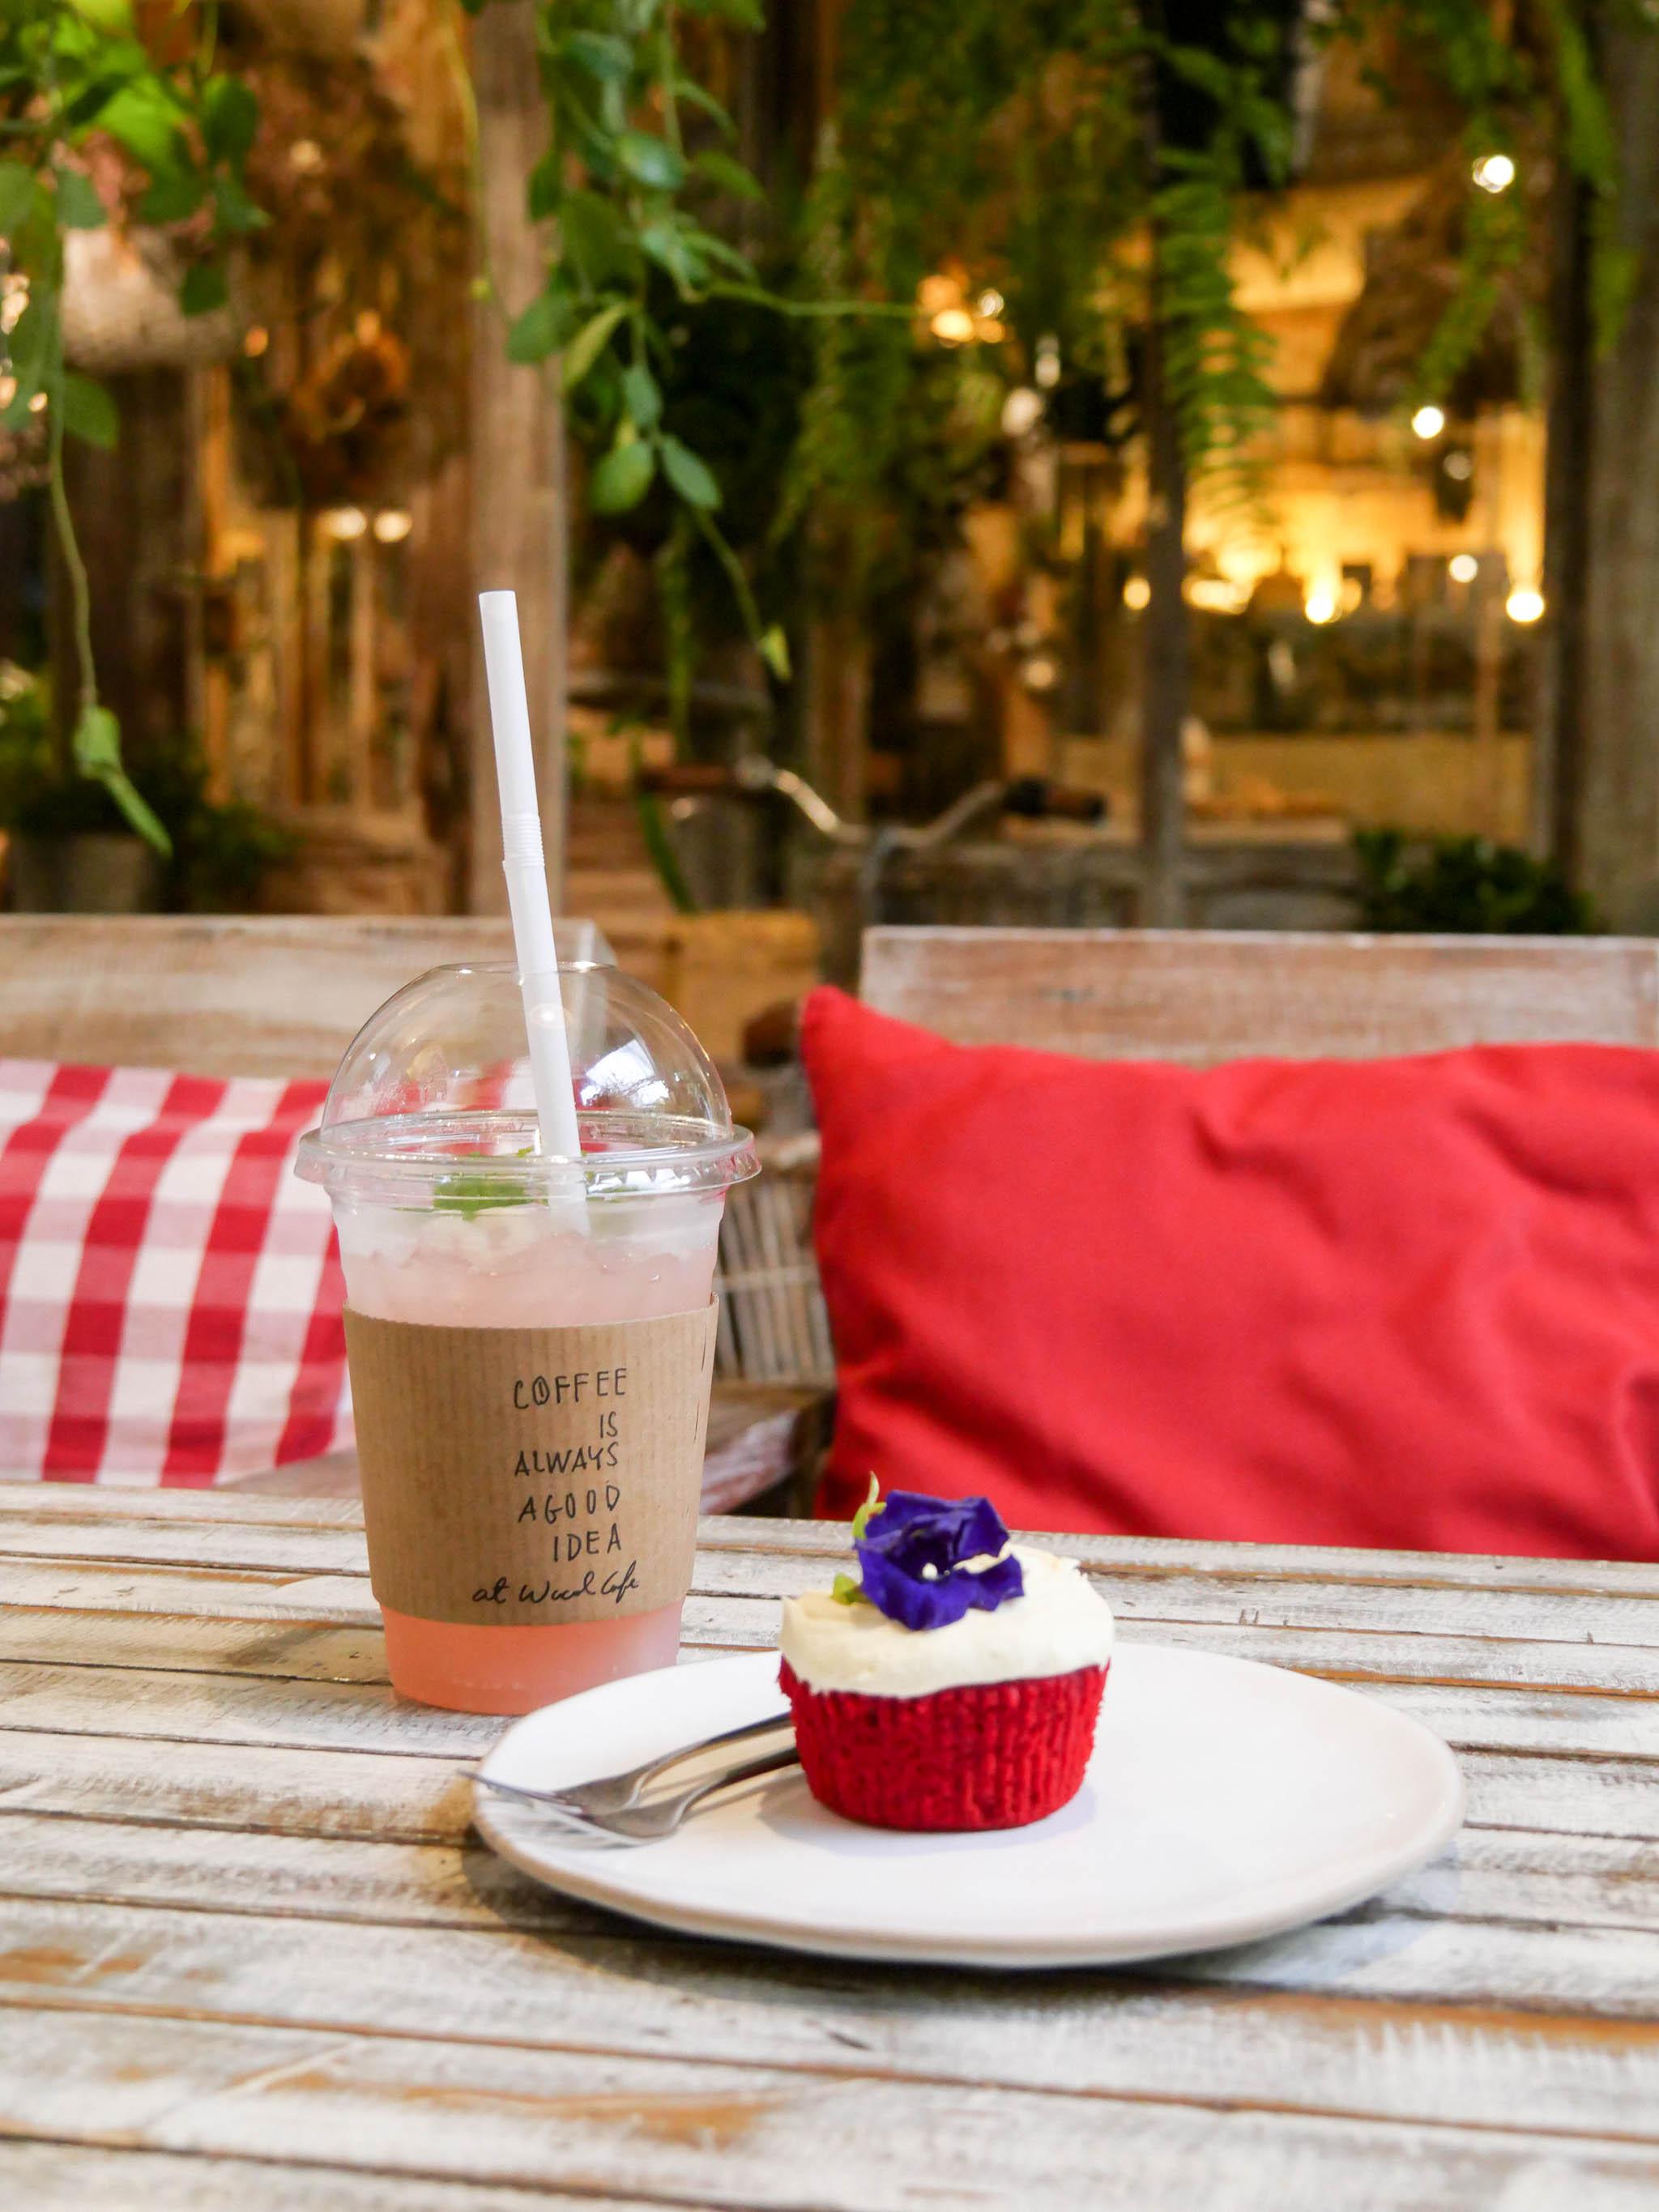 "7 Simply Creative Cafe & Bar ในย่านไลฟ์สไลต์สุดฮิป กับ 24 Hr. Co-Working Space กลาง New Interchange ""รัชดา - ลาดพร้าว"" 41 - cafe"